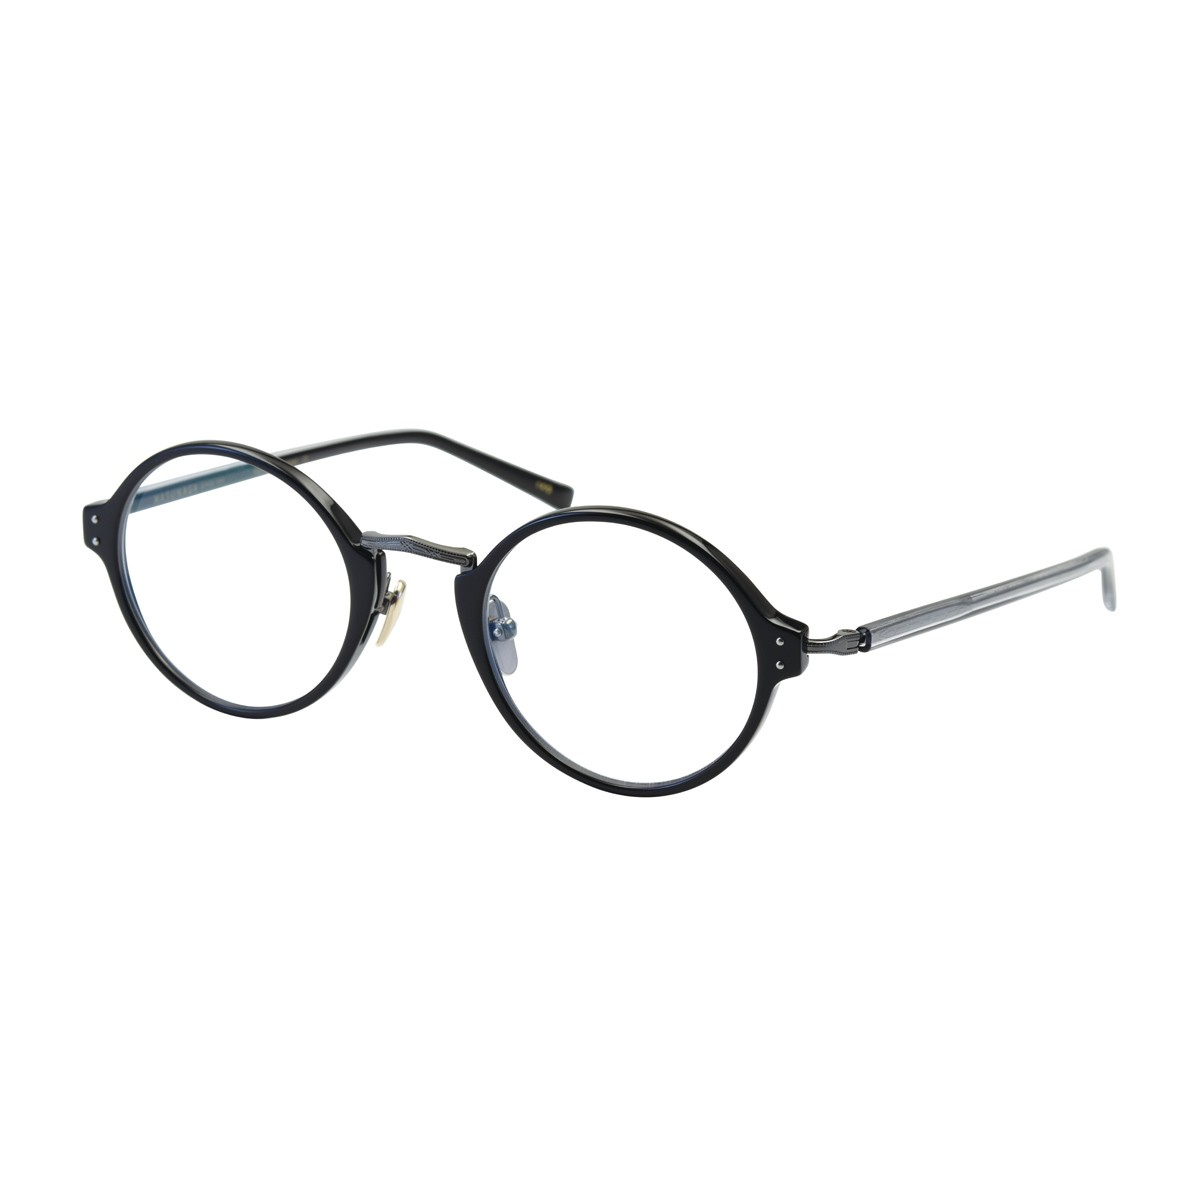 Masunaga GMS-818 | Men's eyeglasses